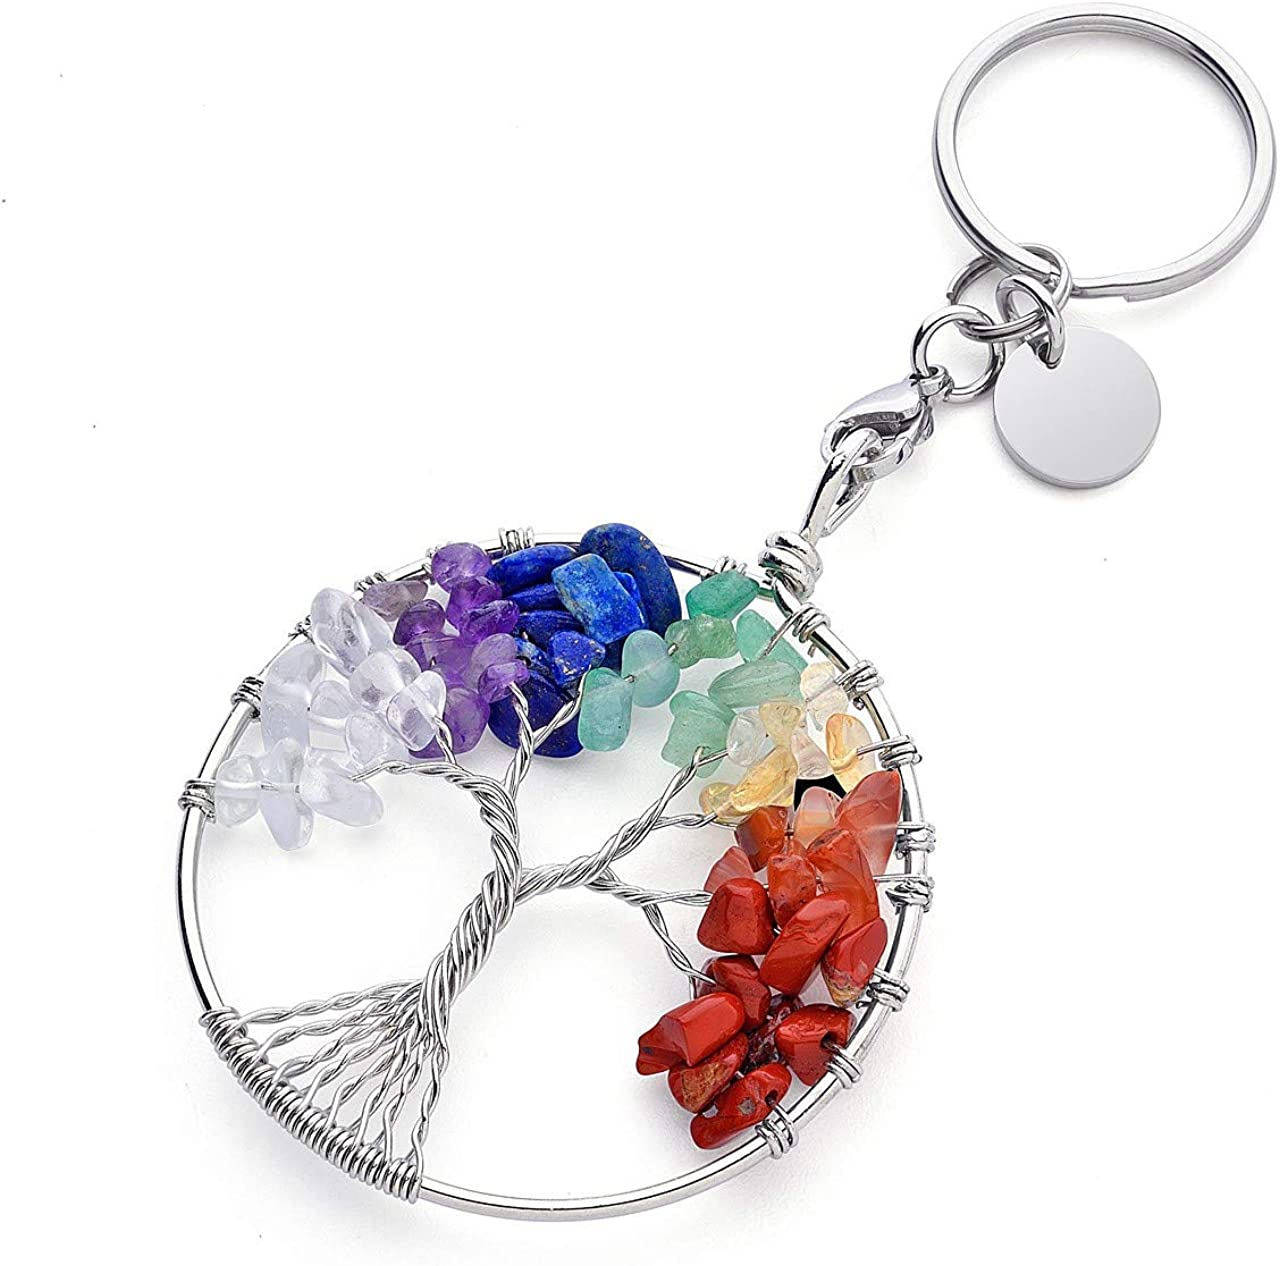 MANIFO 7 Chakra Keyring Healing Crystal Tree of Life Keychain Gemstone Key Chain Charm for Women